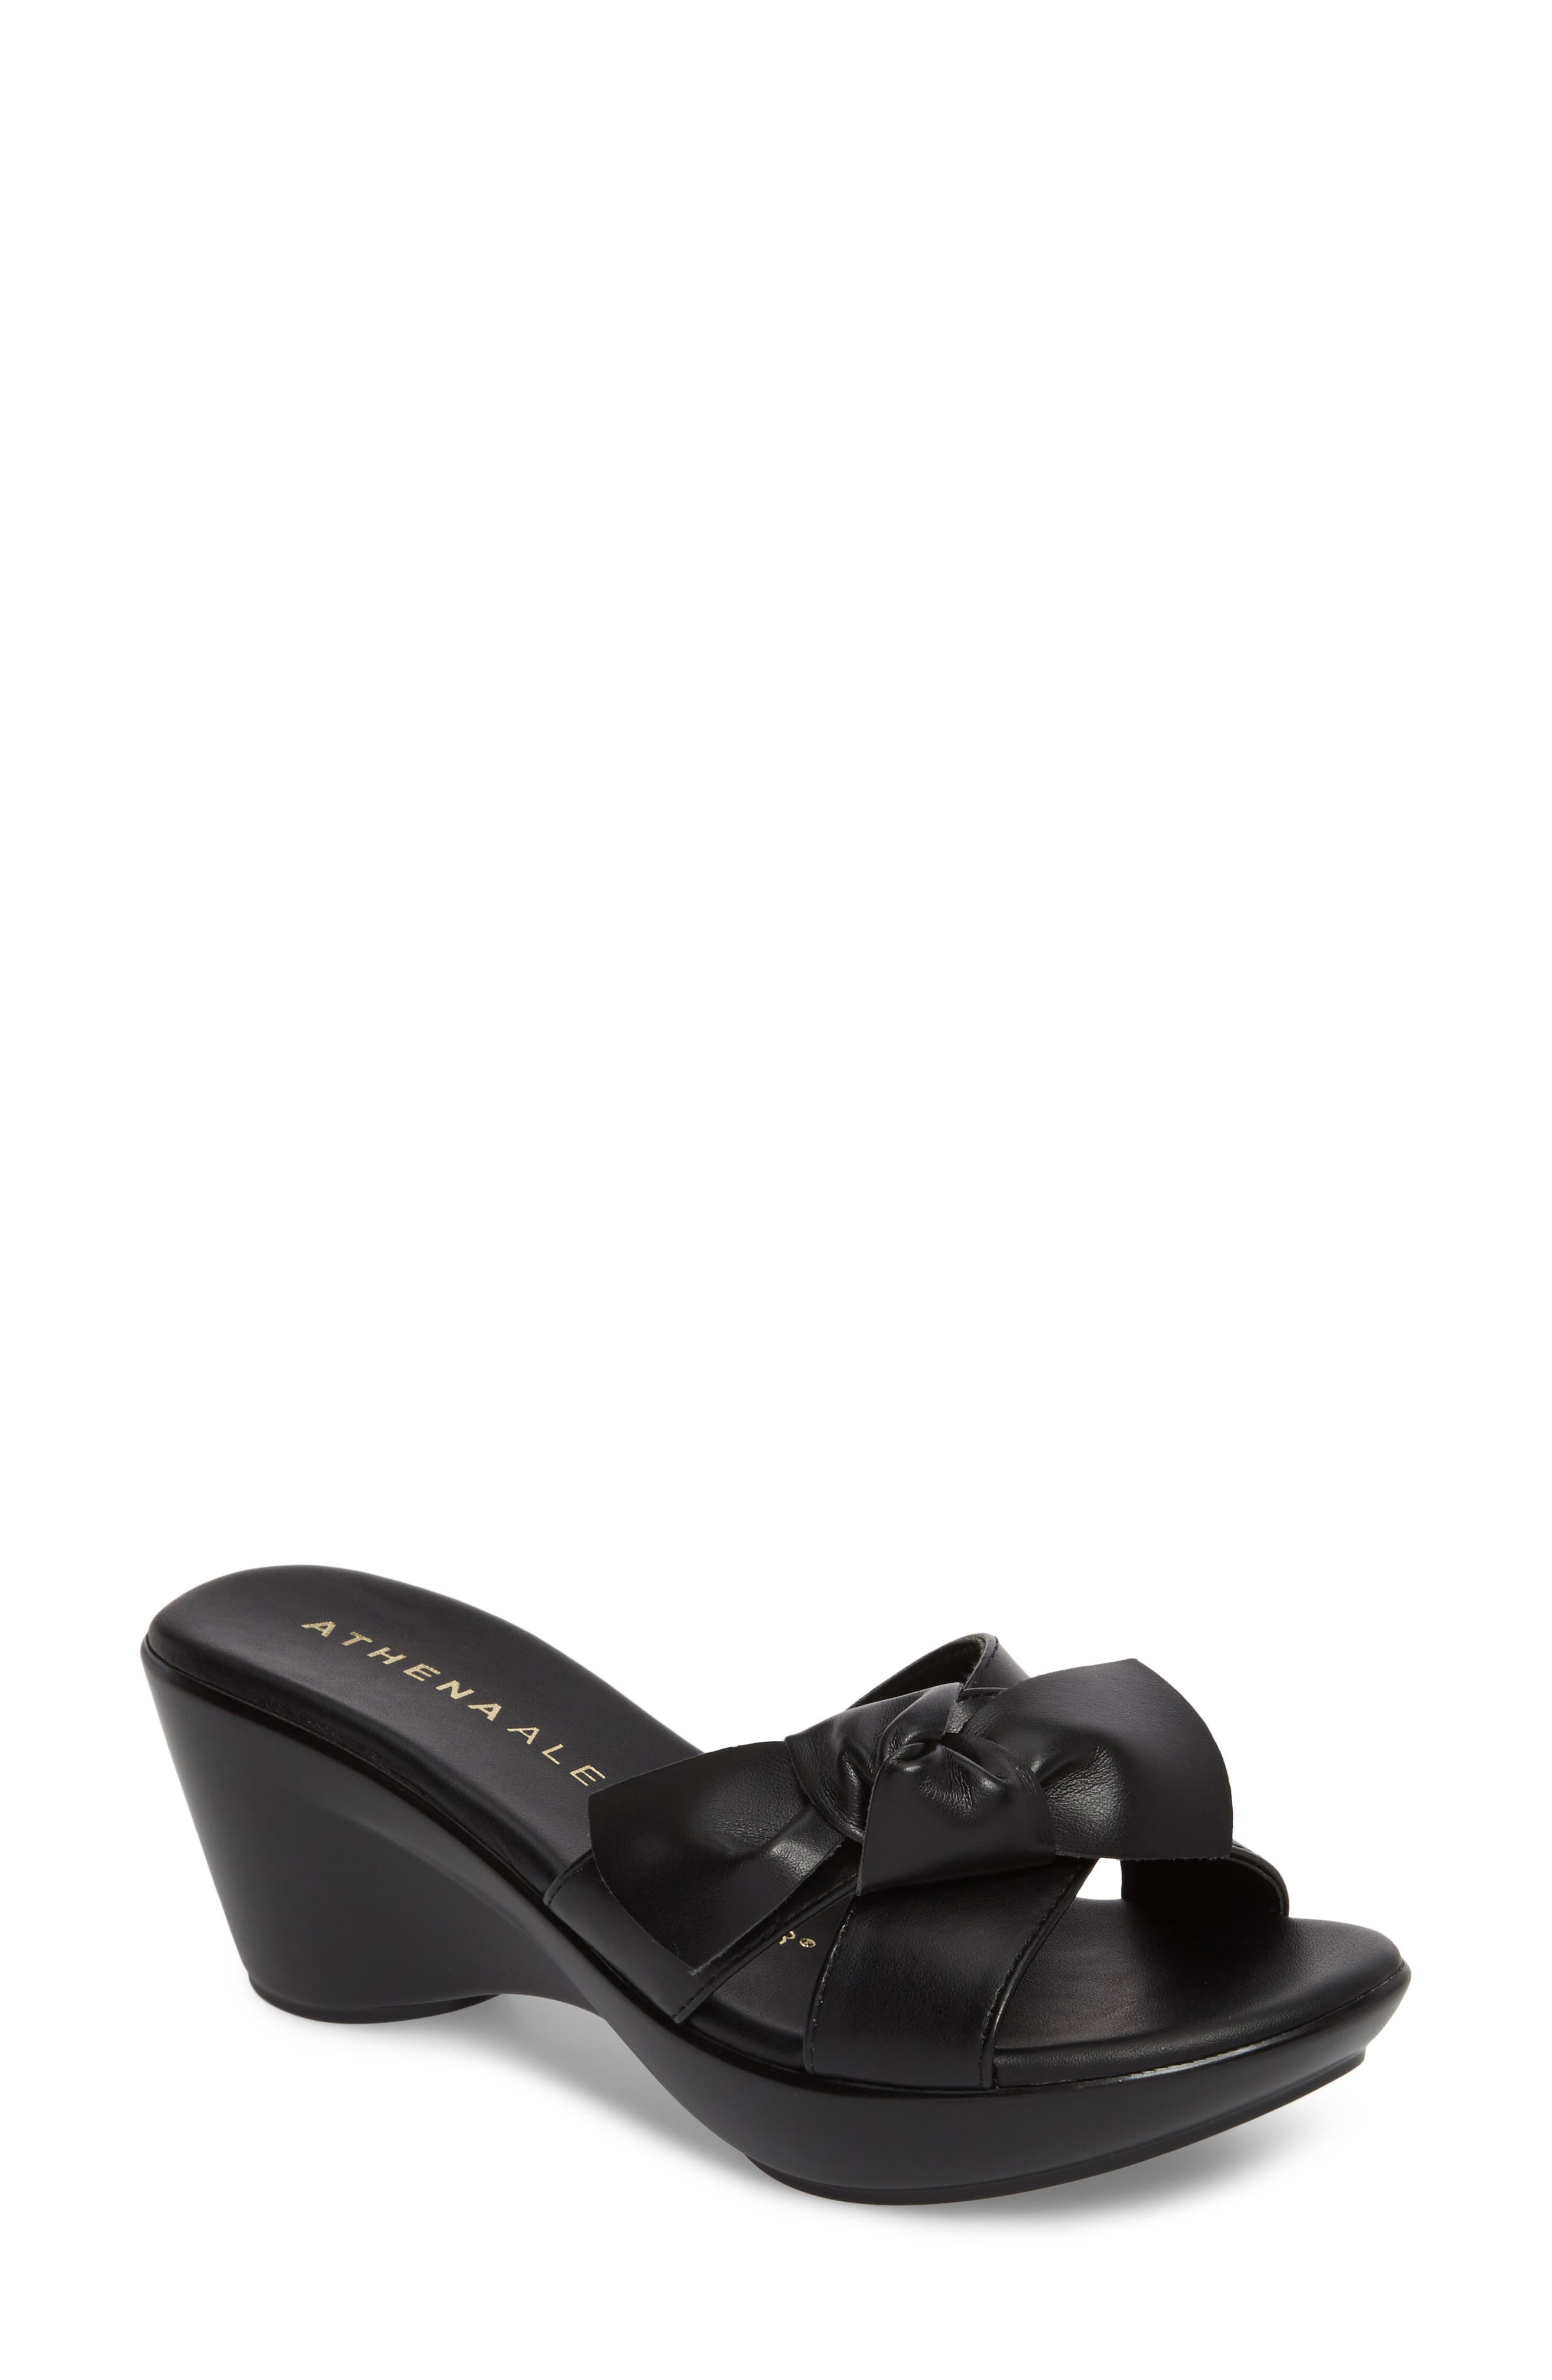 Giada Wedge Sandal,                         Main,                         color, Black Fabric